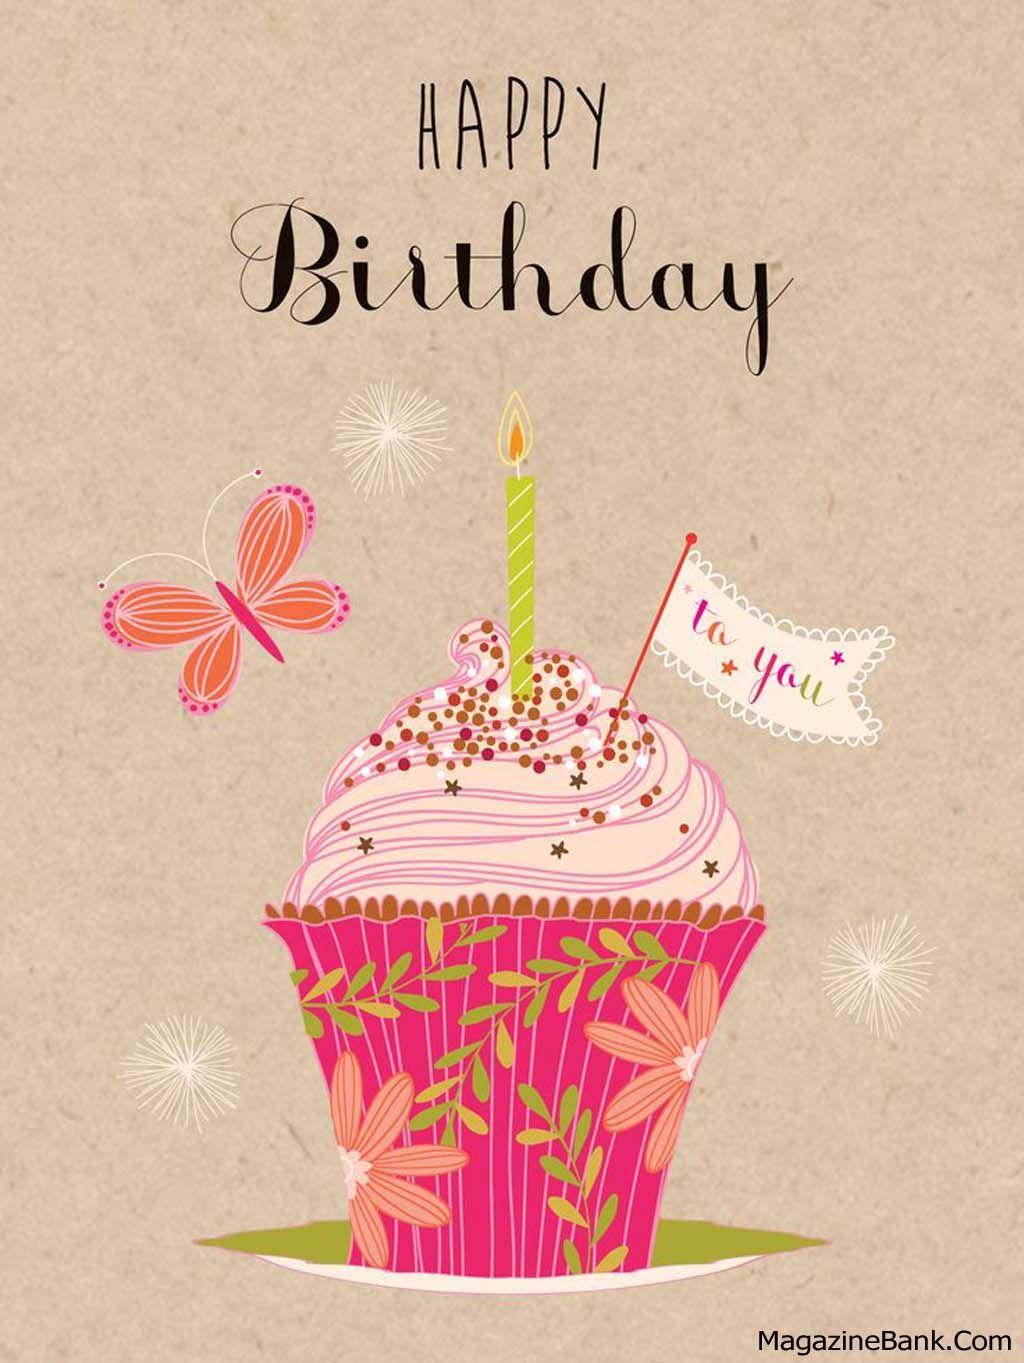 Happybirthdayimagesforwishesgreetingg 10241363 Birthday